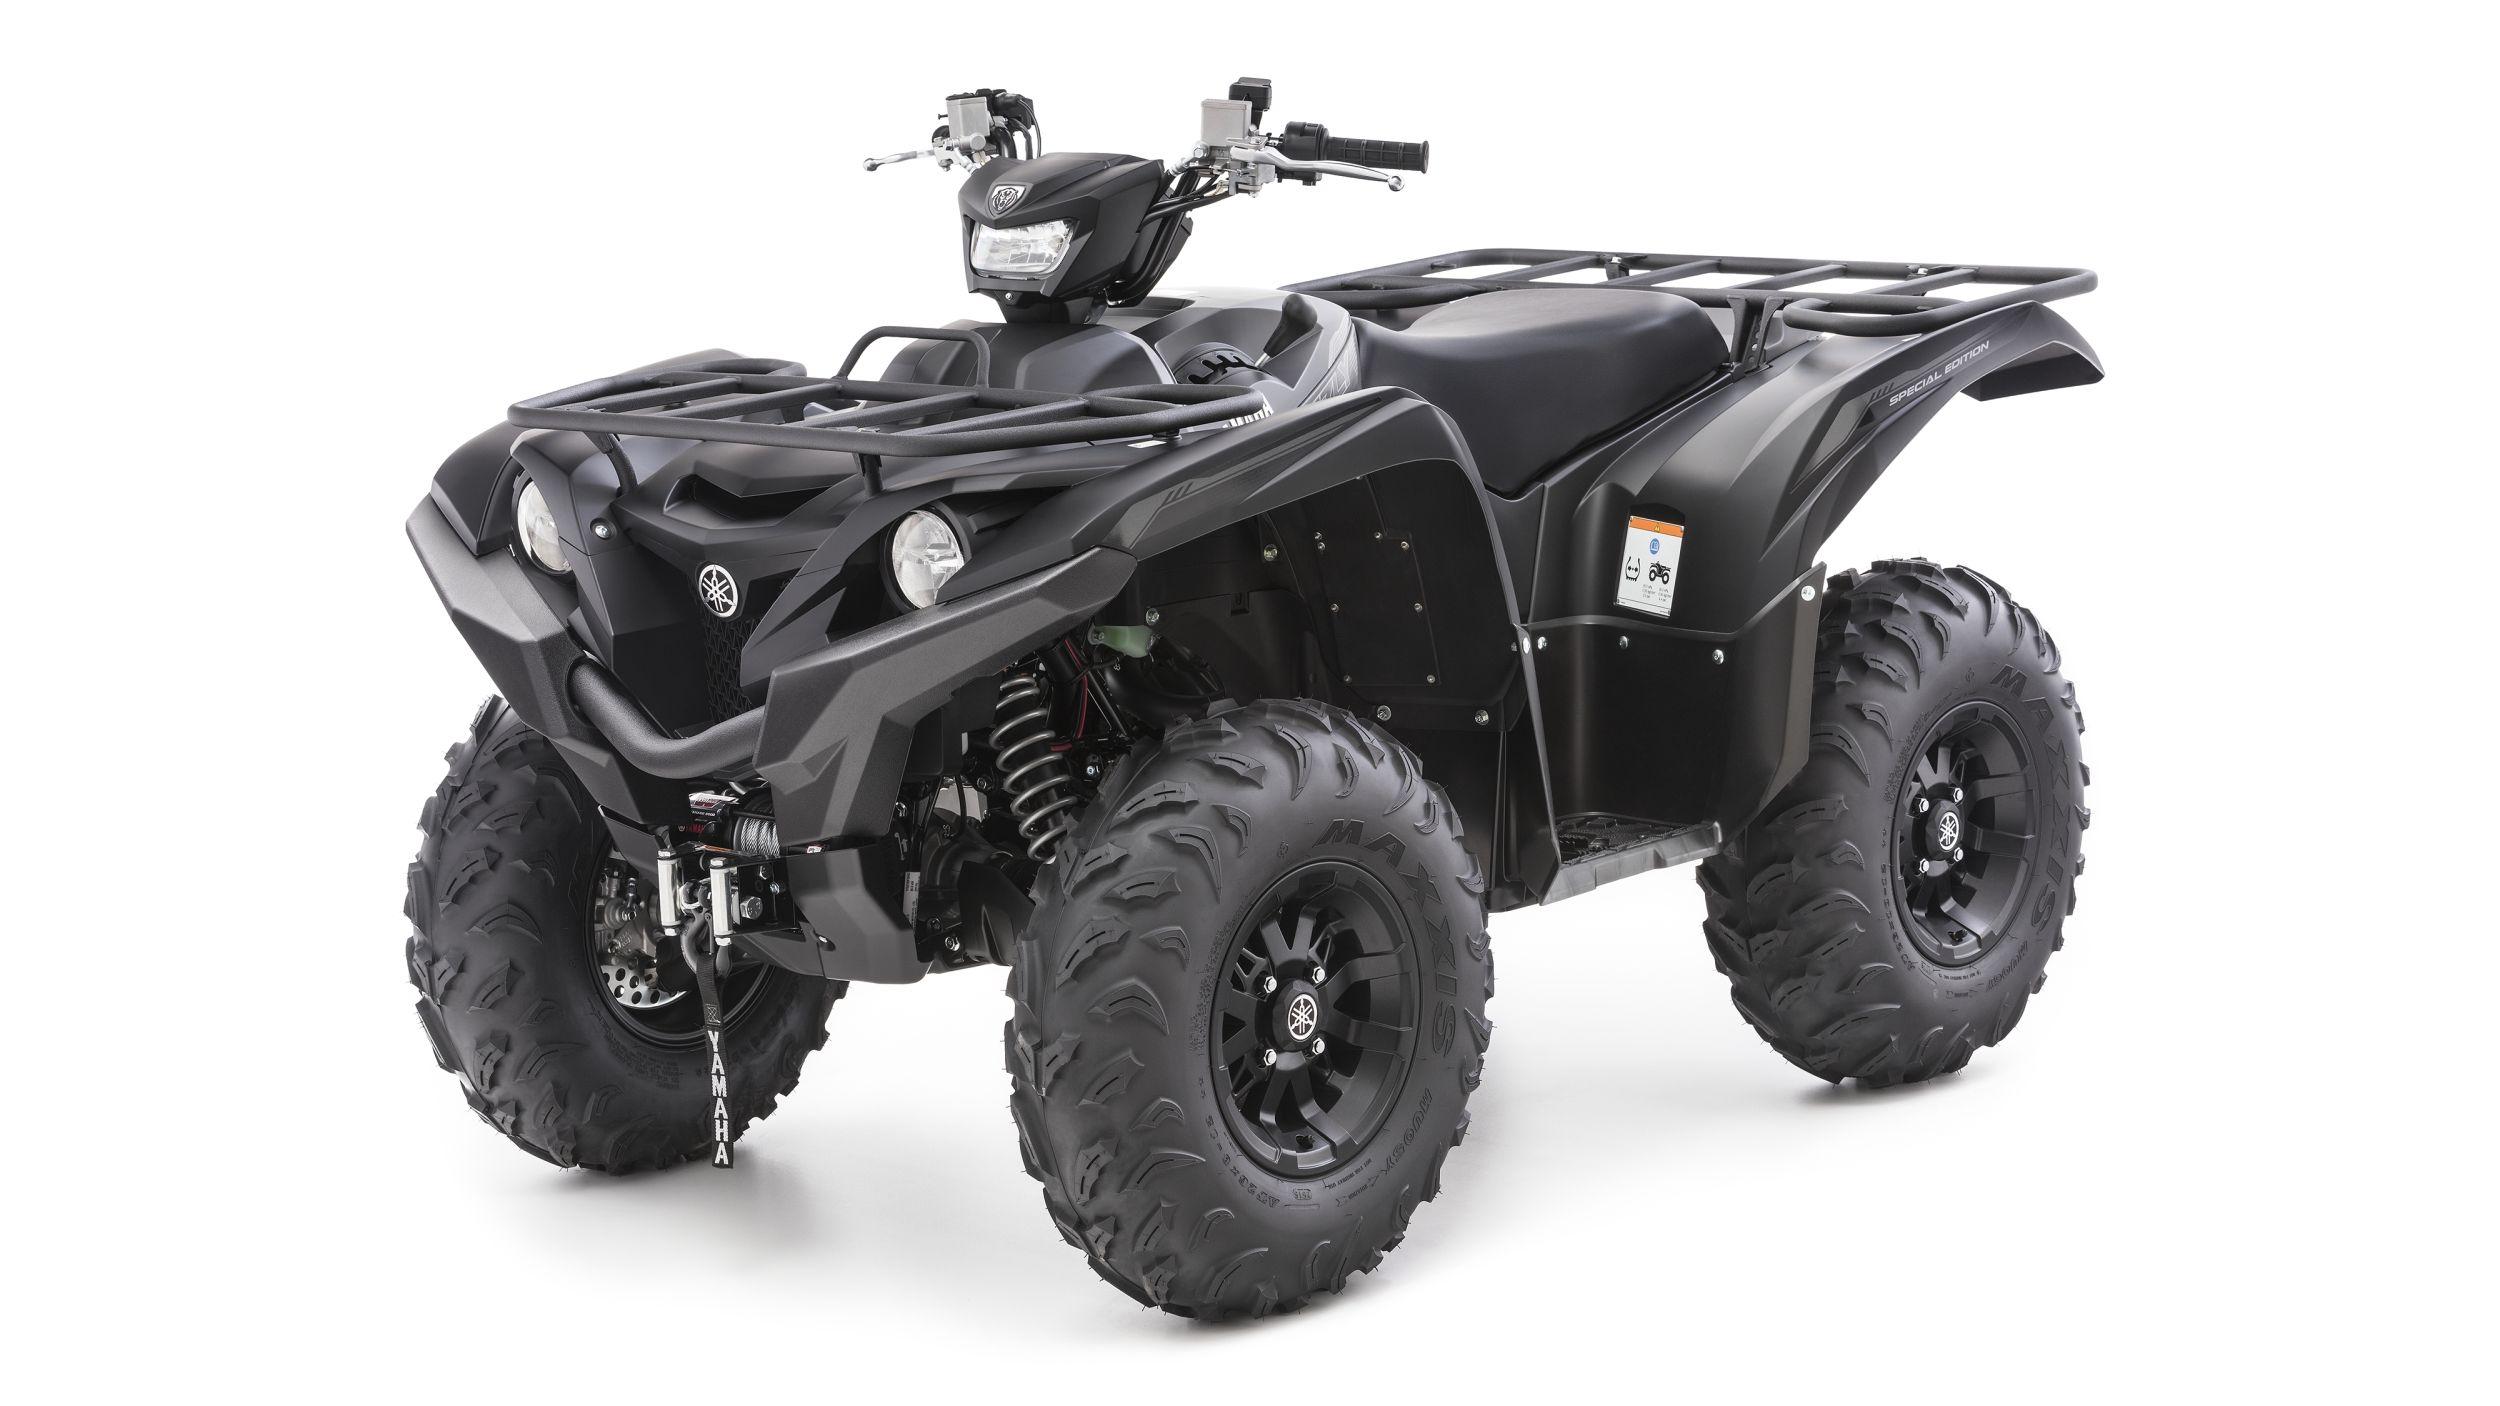 Yamaha grizzly 700 eps alle technischen daten zum modell for 2018 yamaha grizzly 700 specs